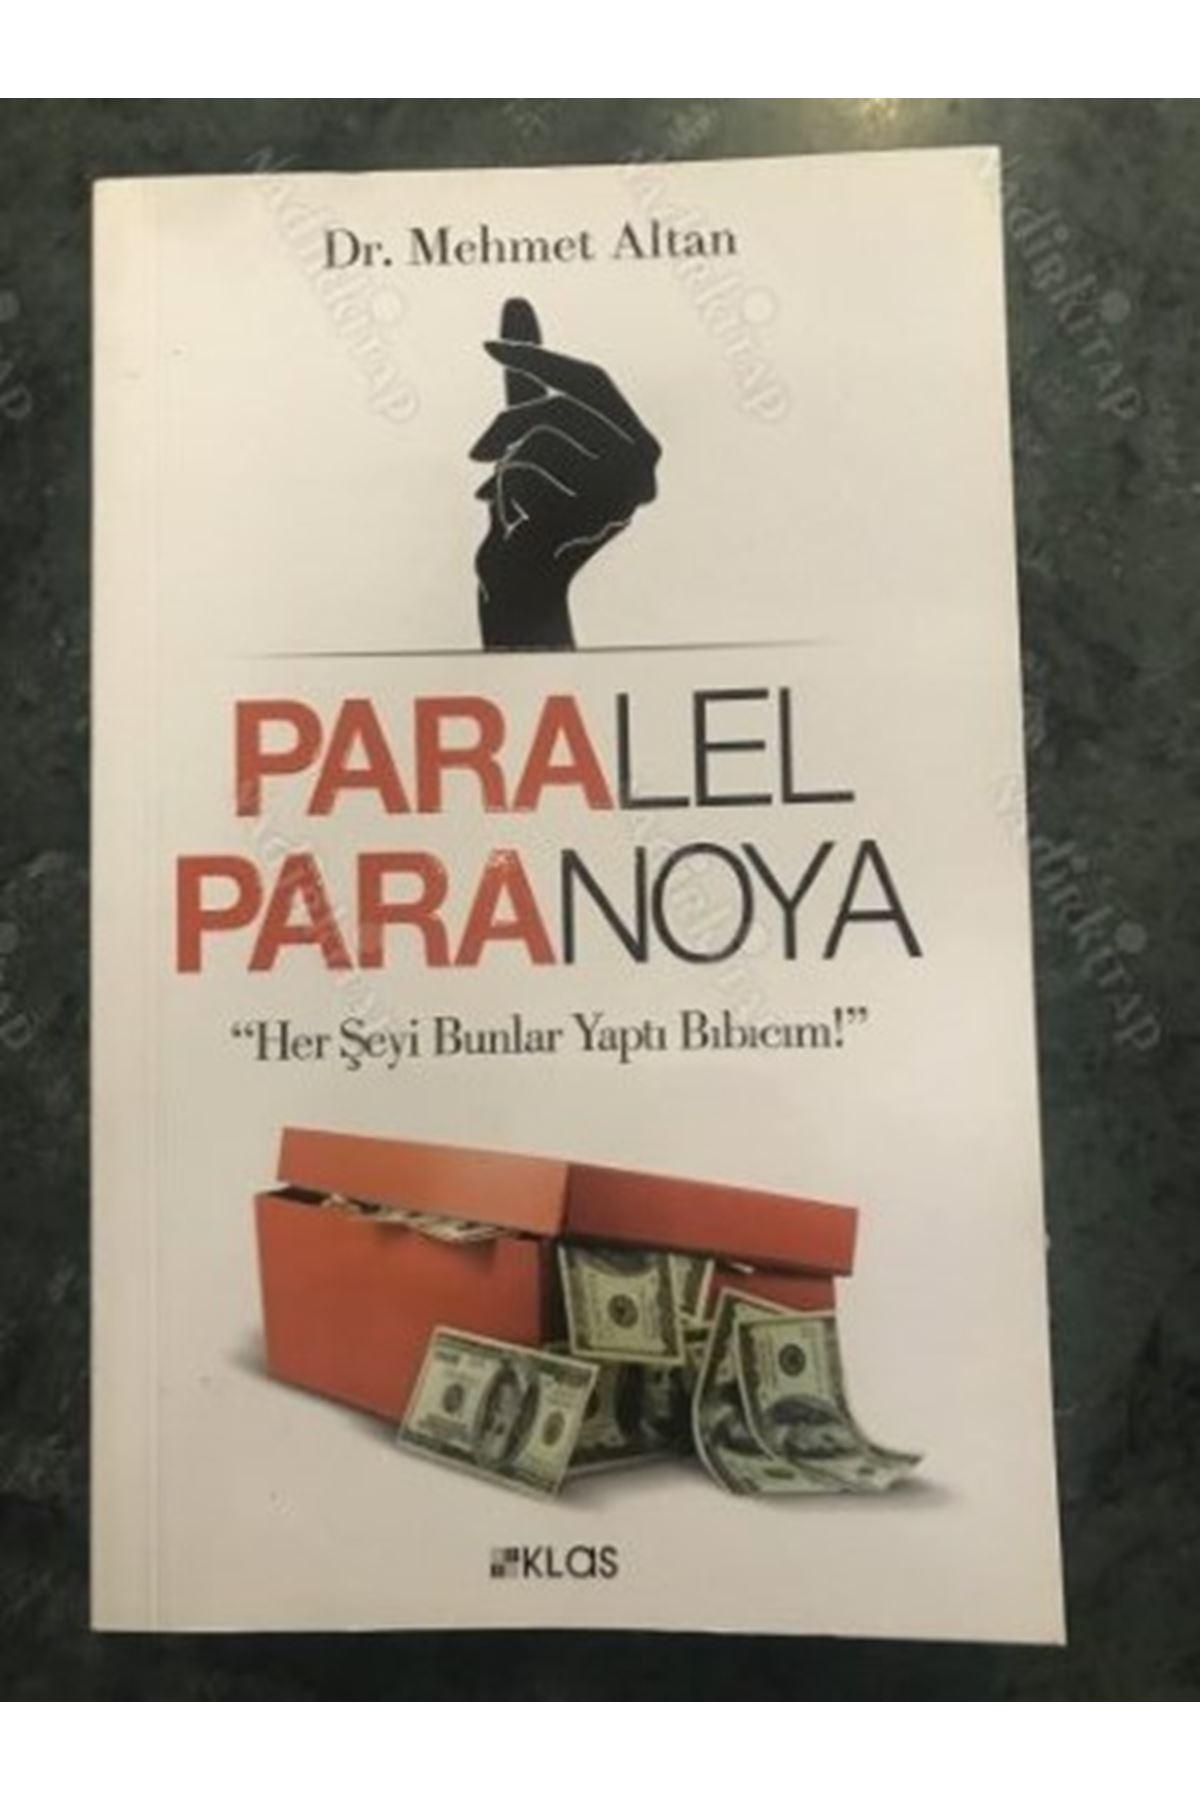 DR. MEHMET ALTAN - PARALEL PARANOYA